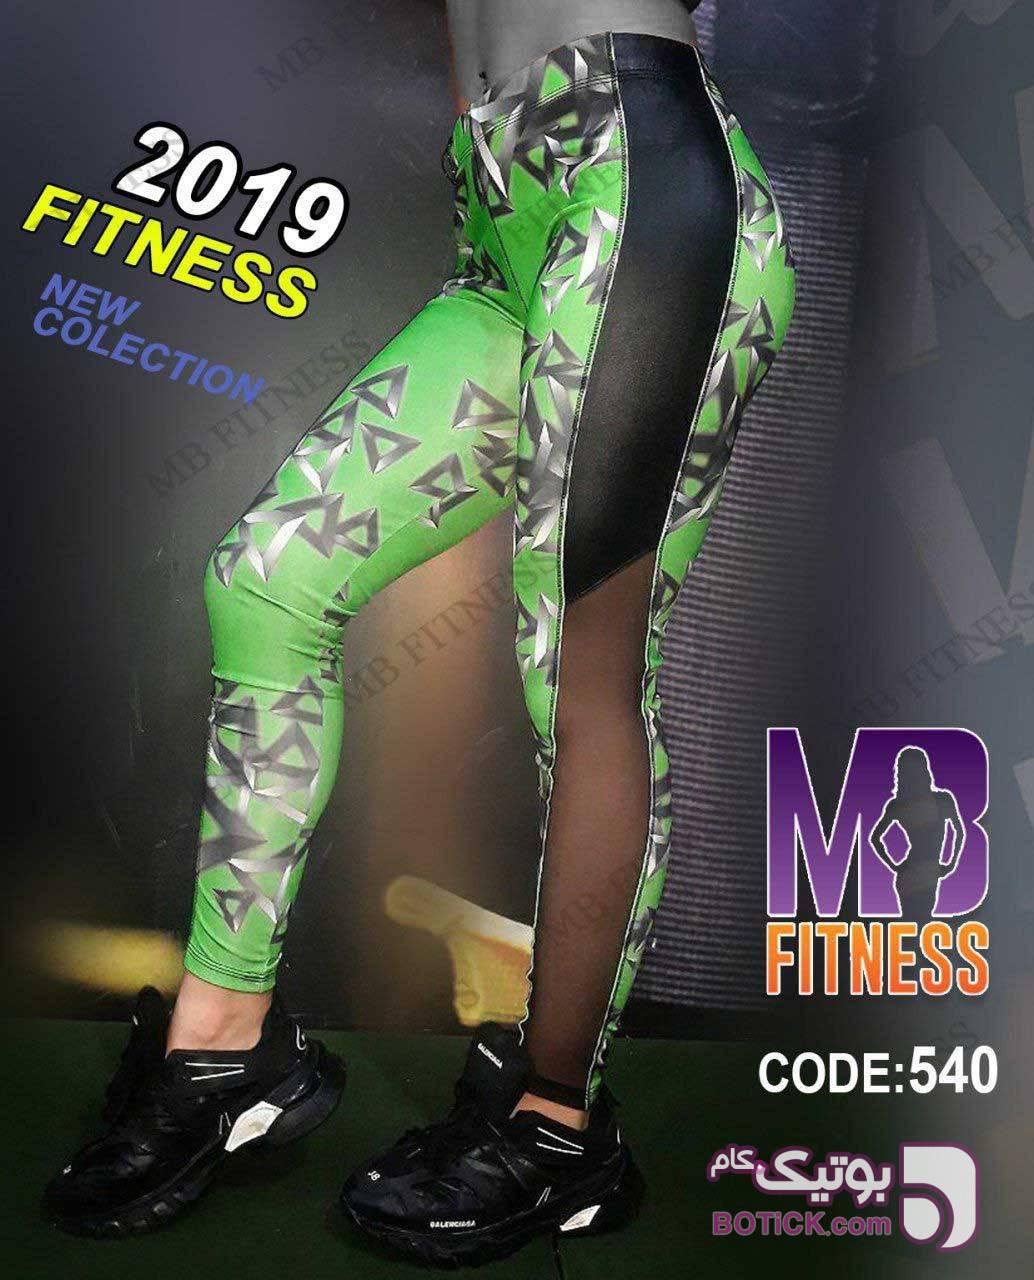 code:540 لگ اسپورت MB سبز ست ورزشی زنانه